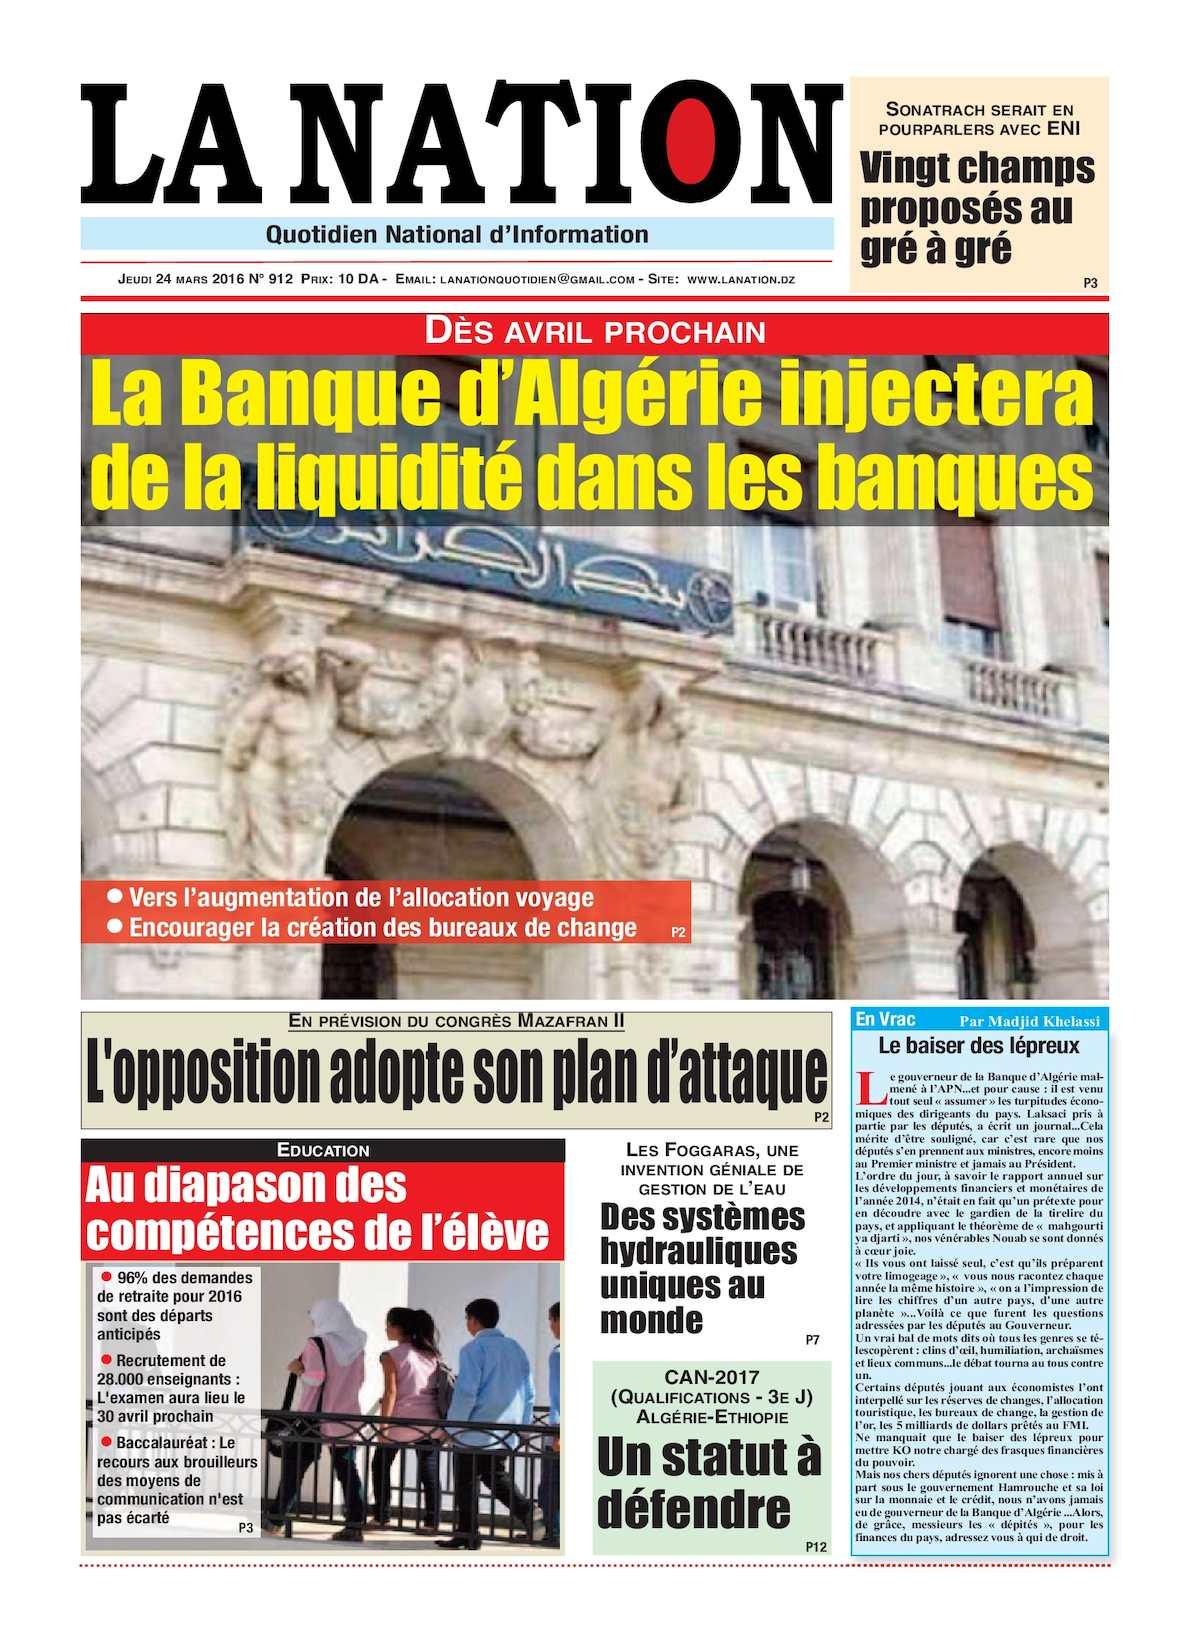 La Nation Edition N 912